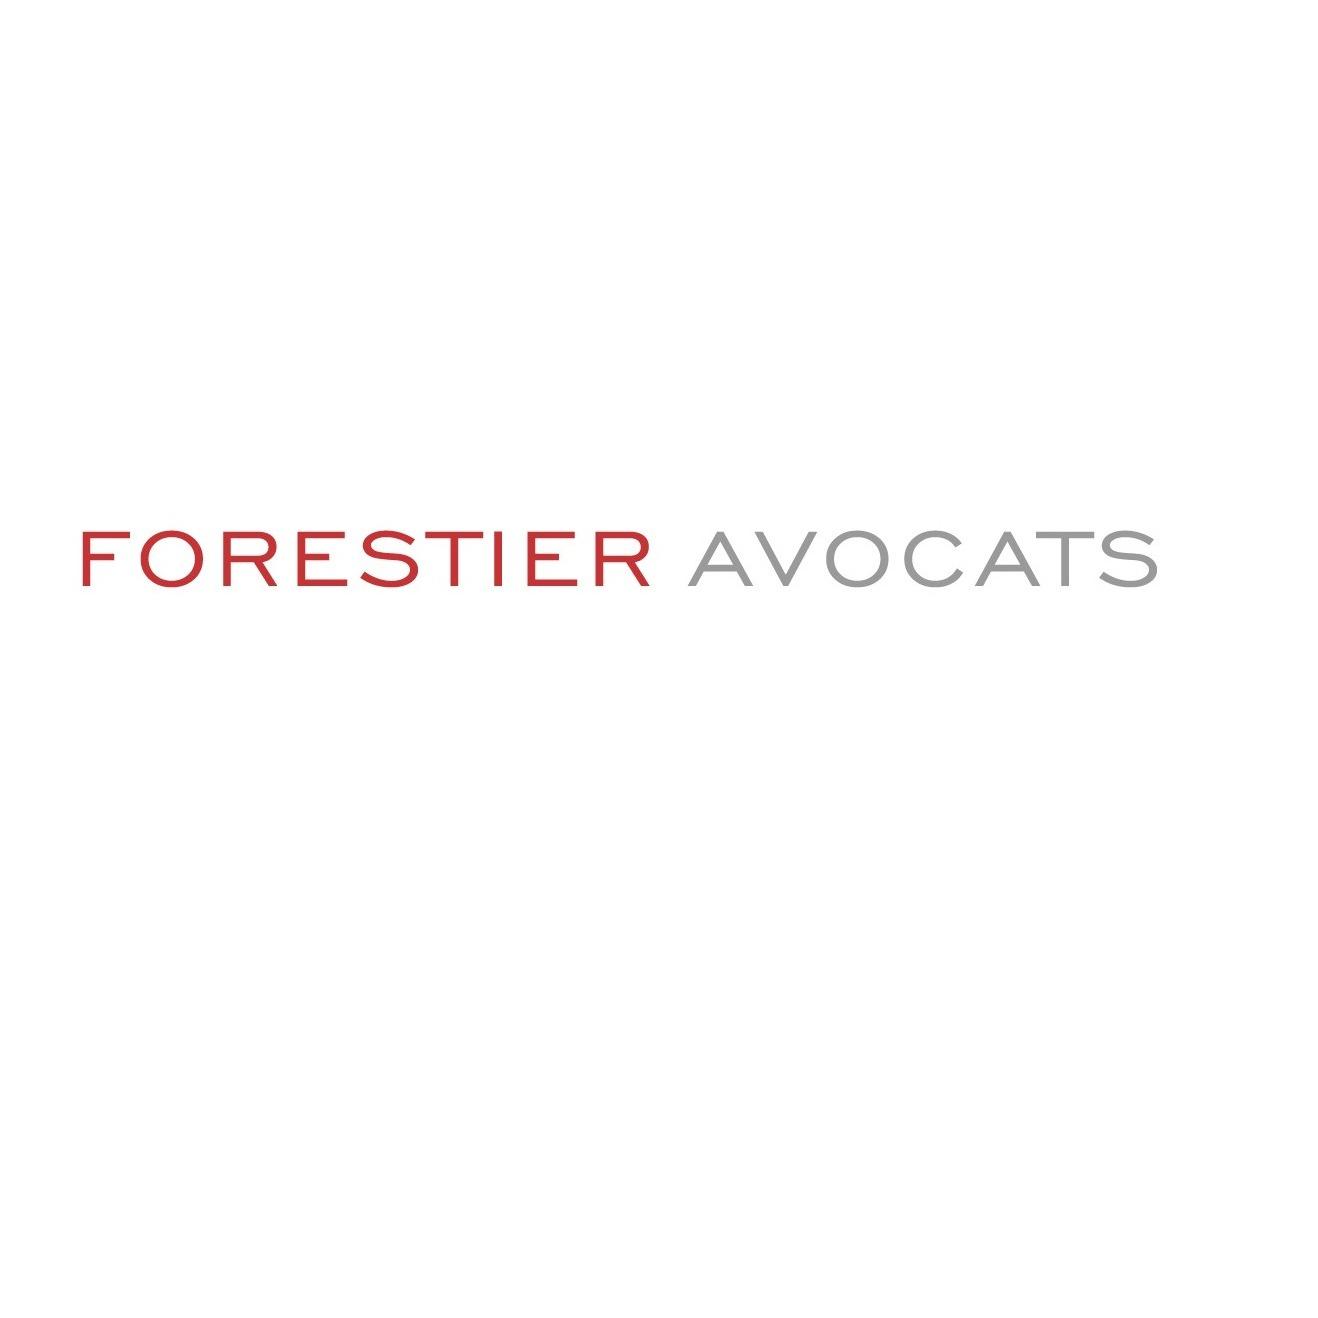 the Forestier Avocats logo.